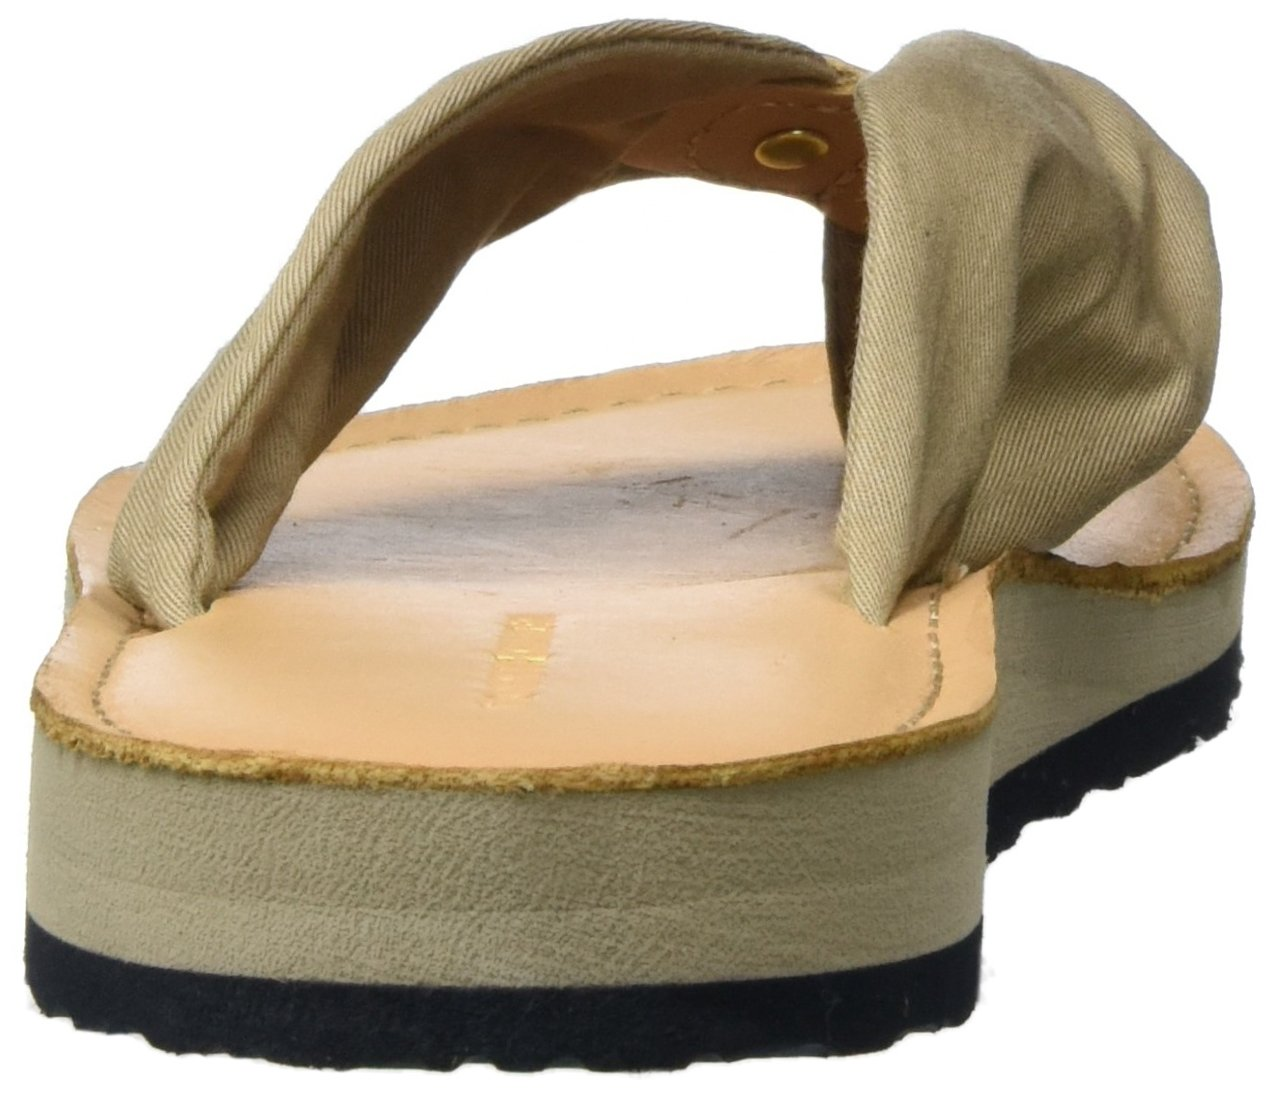 Tommy Beach Hilfiger Damen Leder Footbed Beach Tommy Sandale Zehentrenner Beige (Cobblestone 068) 28cedb